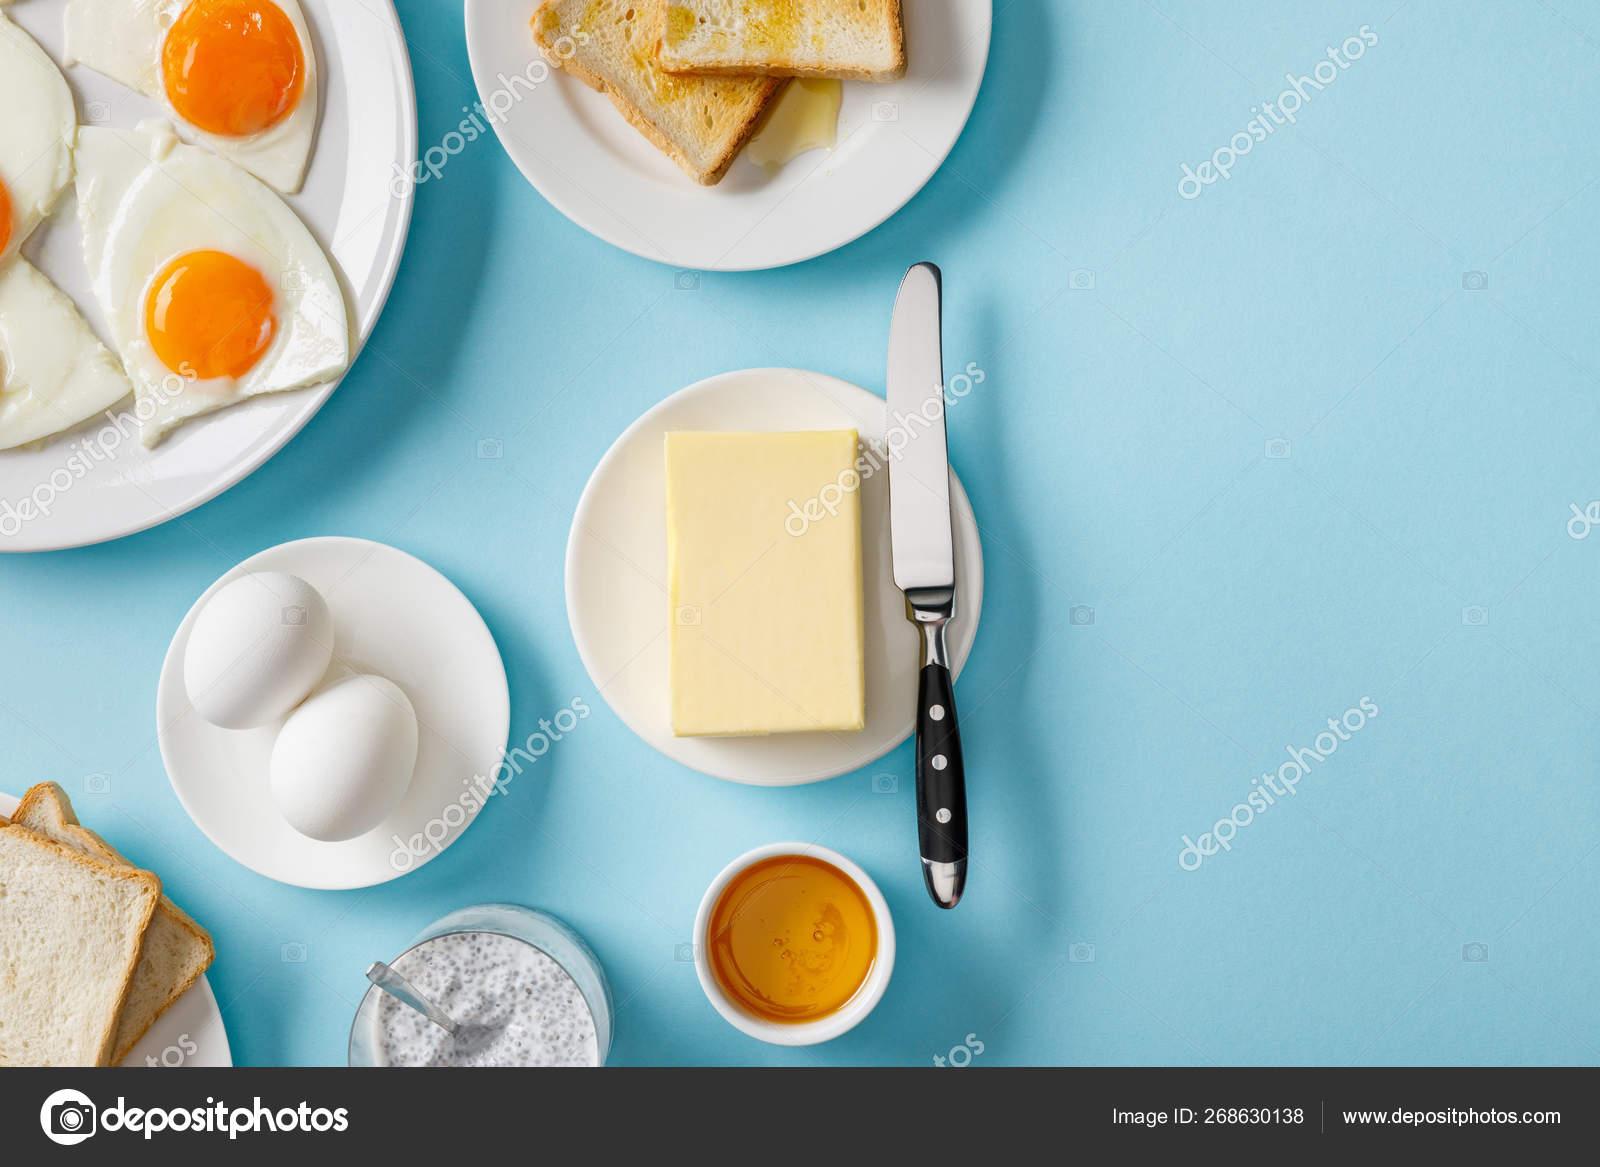 Top View Butter Toasts Fresh Fried Eggs White Plates Yogurt Stock Photo C Antonmatyukha 268630138